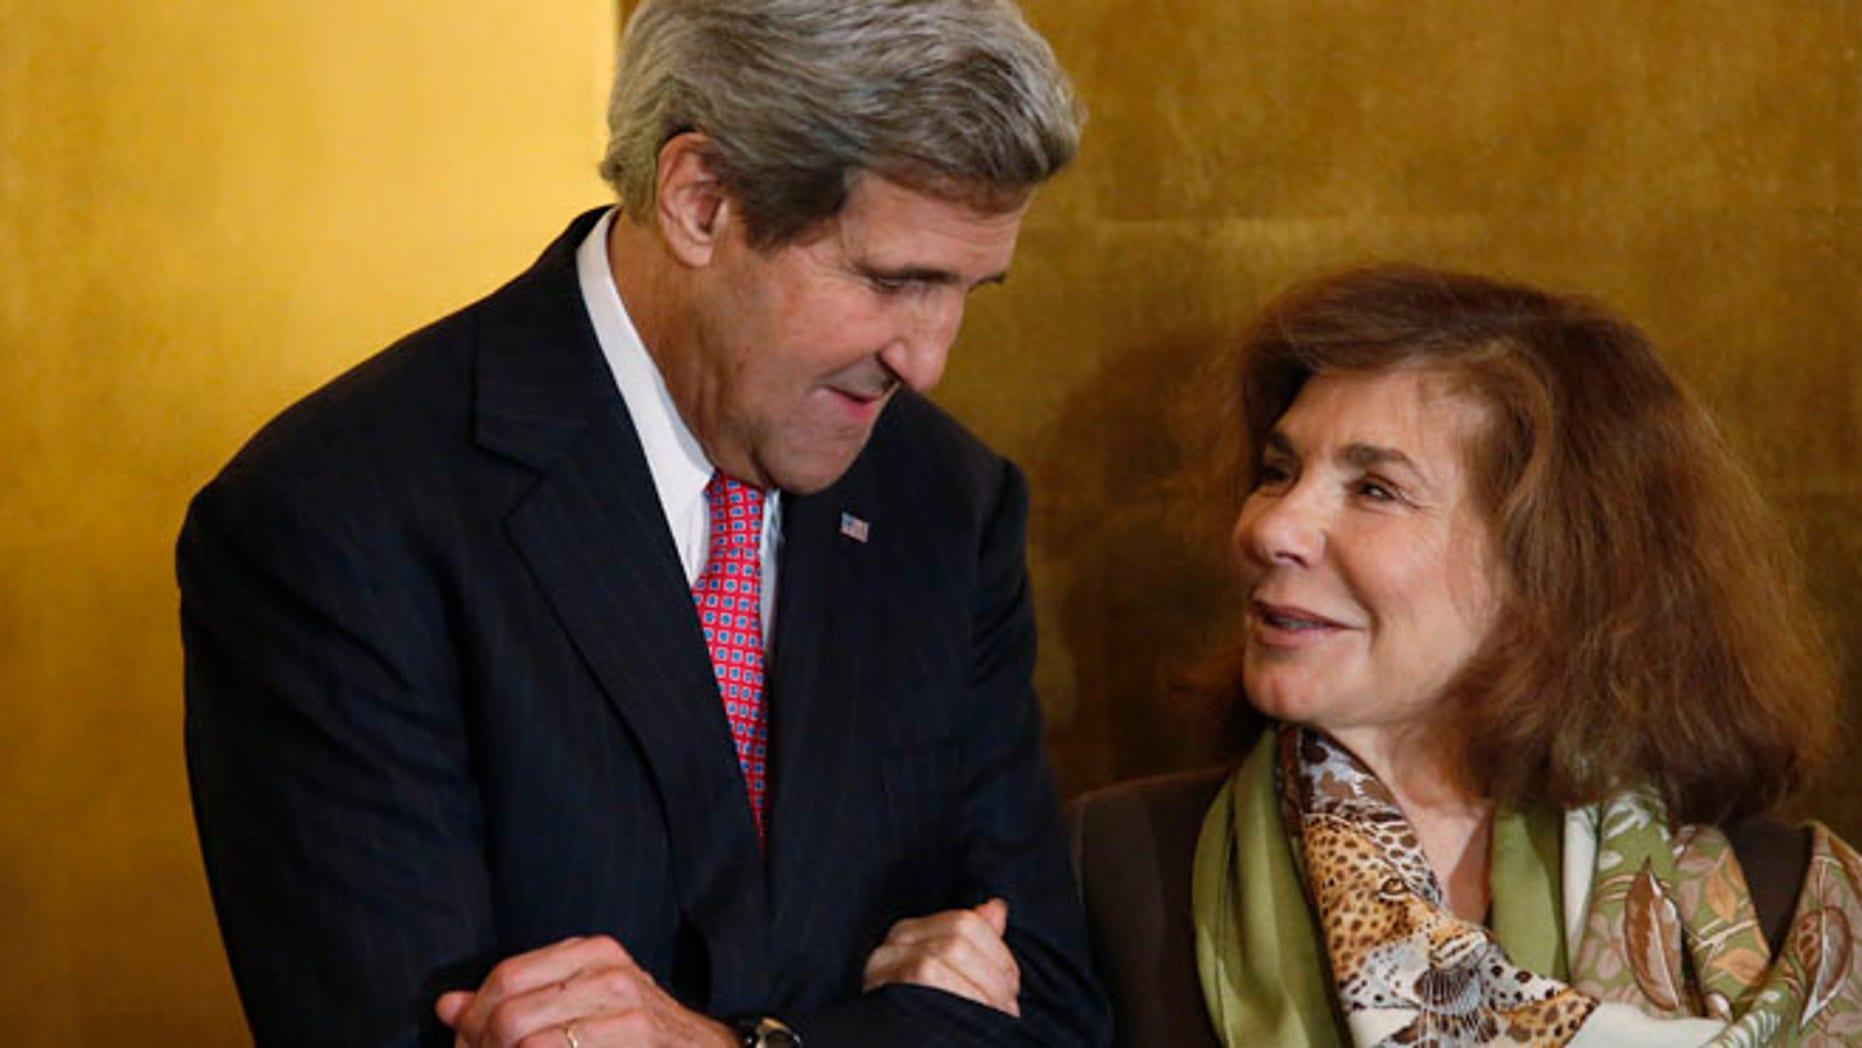 This November 12, 2013 photos shows U.S. Secretary of State John Kerry and his wife Teresa Heinz Kerry in Washington.